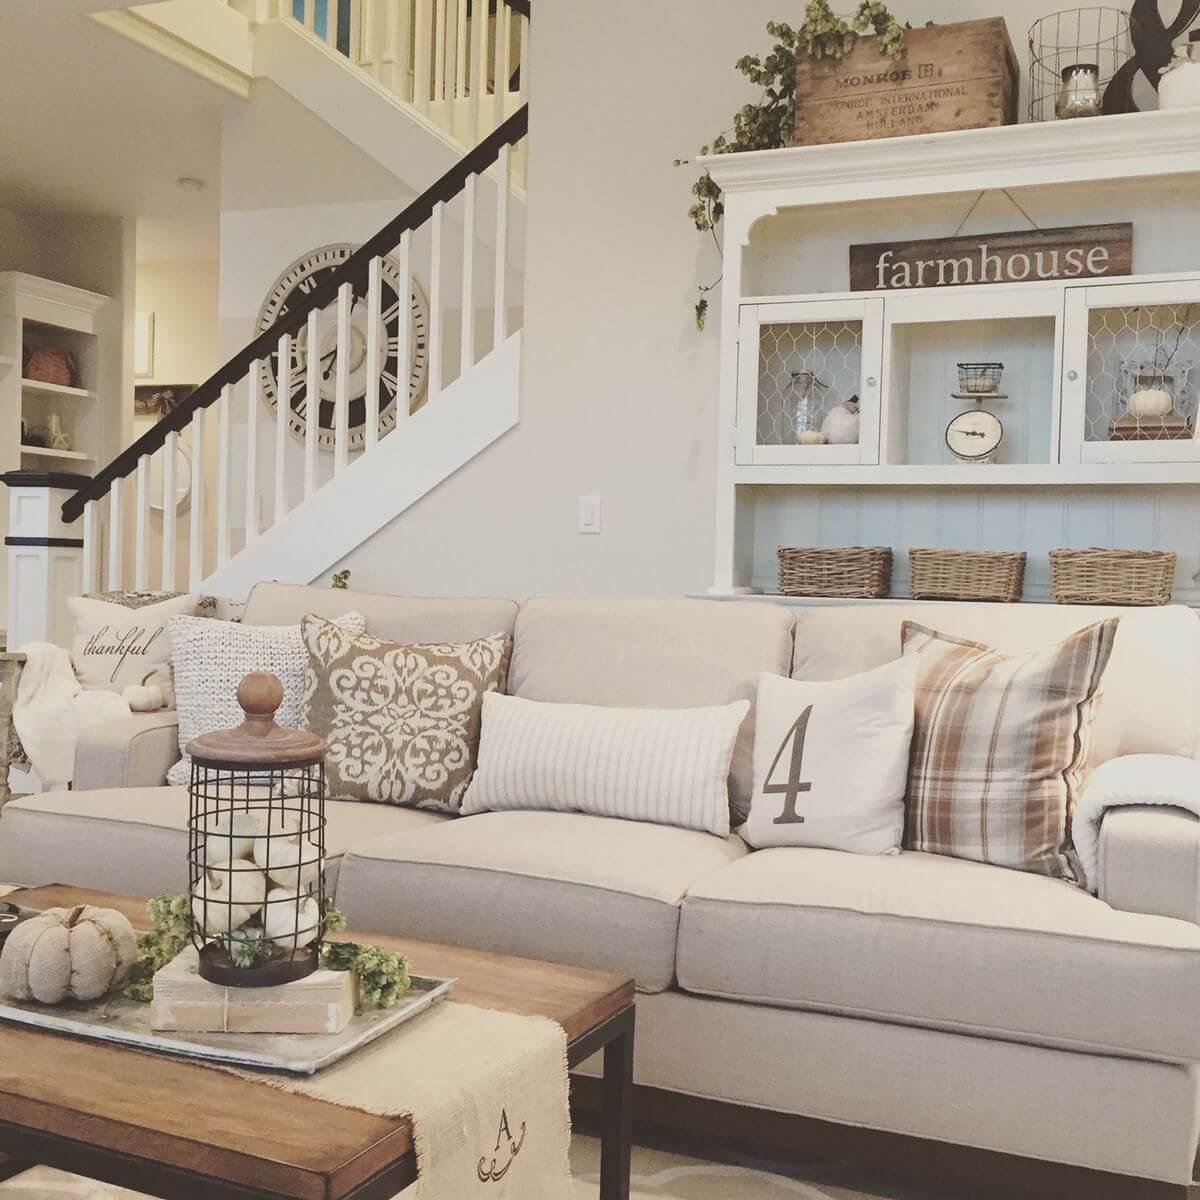 50+ Best Farmhouse Living Room Decor Ideas and Designs for ... on Farmhouse Decorating Ideas  id=42403